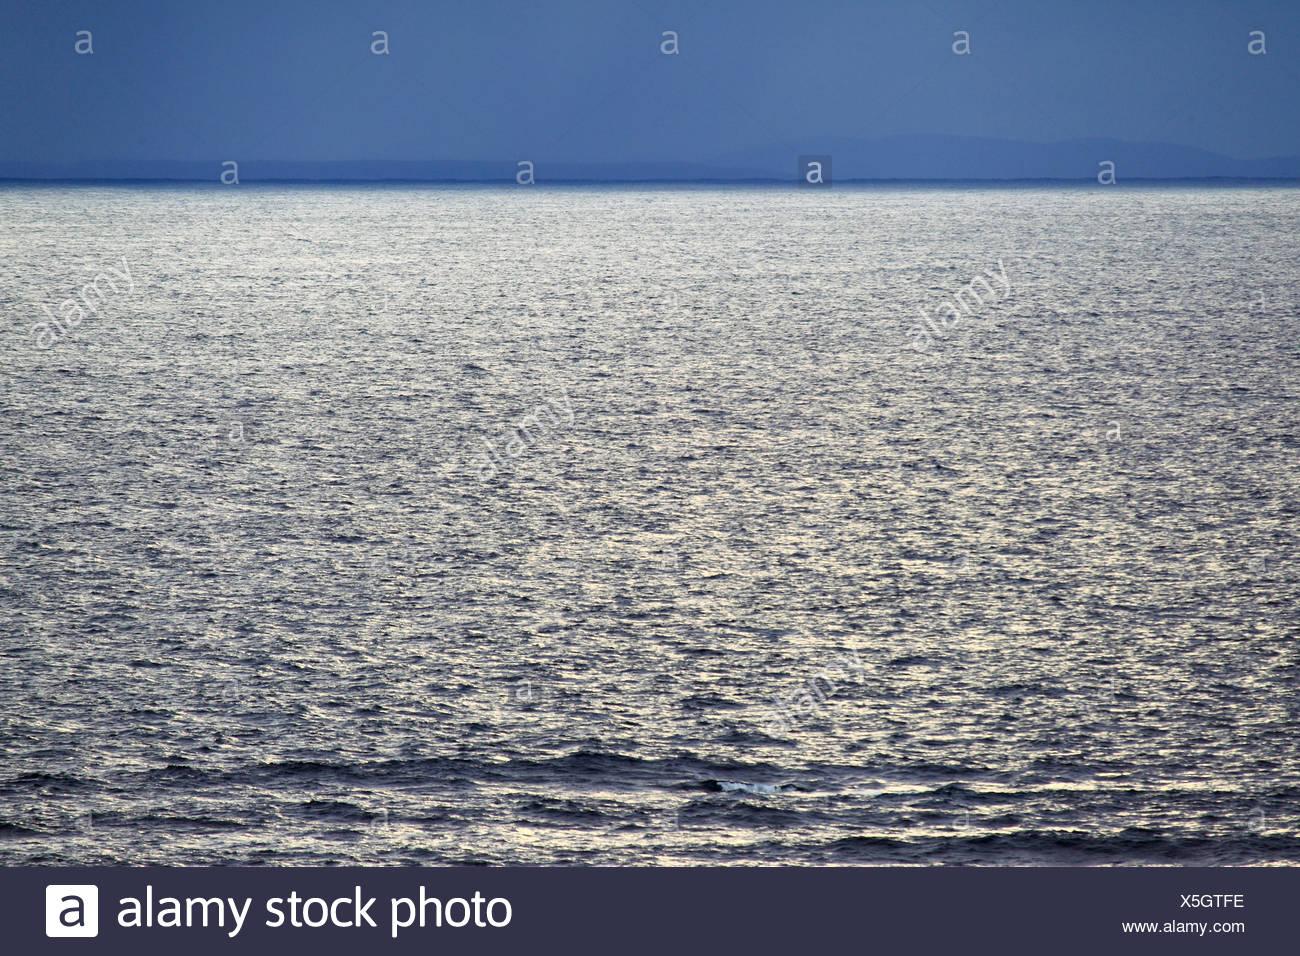 England, Glitzer, hellen Streifen, Silberstreif am Horizont, Meer, Regen, Schottland, Sonnenlicht, UK, Wester Ross, blau, harmonisch Stockbild